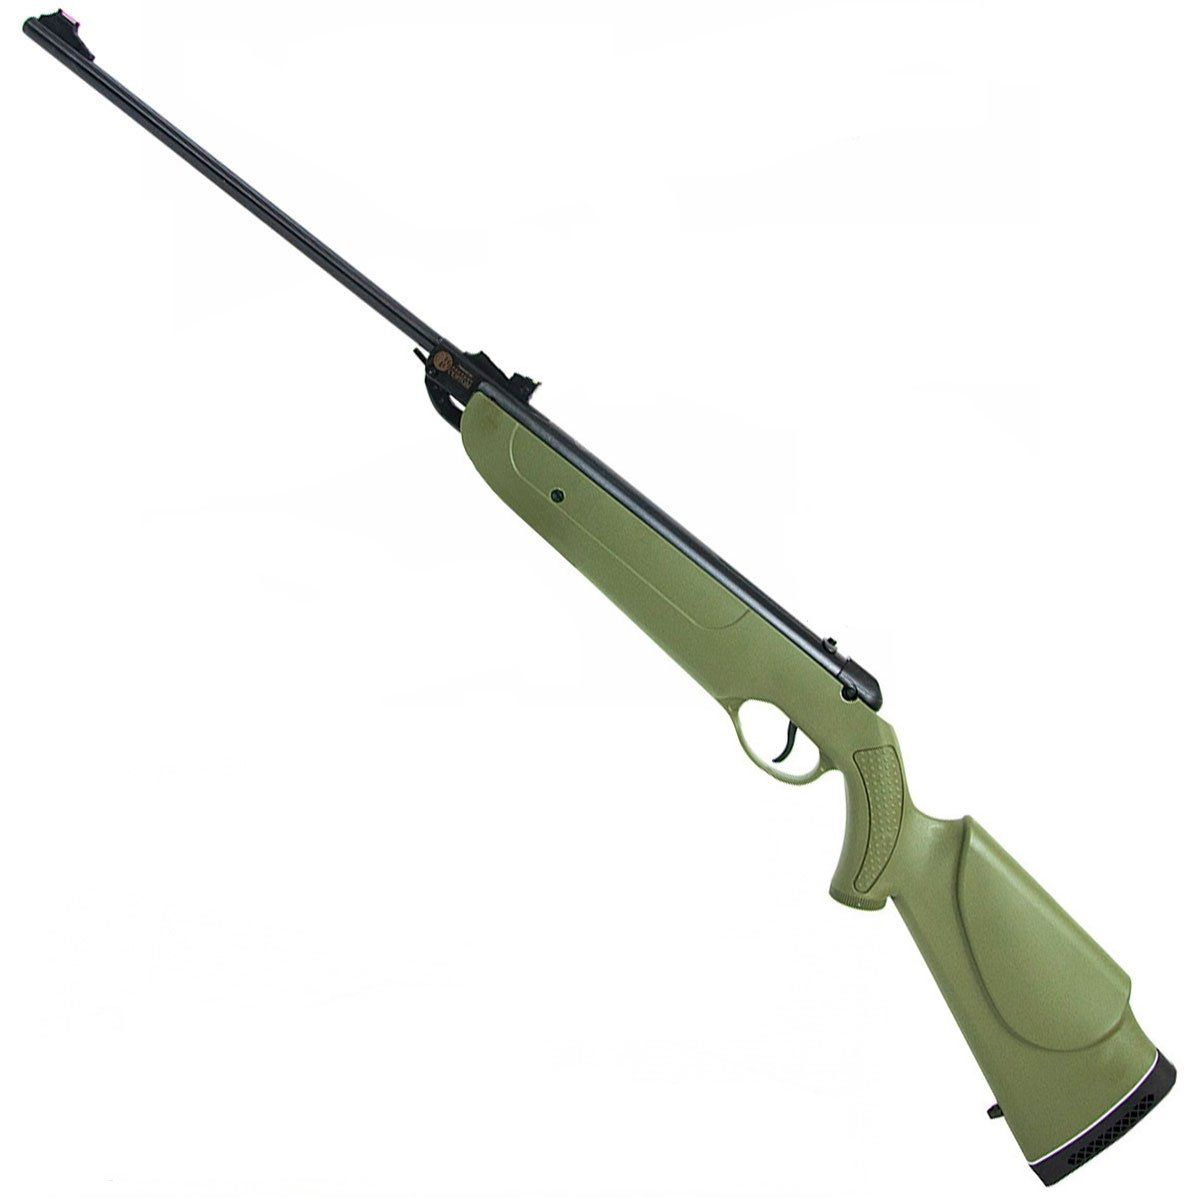 Carabina de Pressão Rossi Dione Army Spring 4,5mm